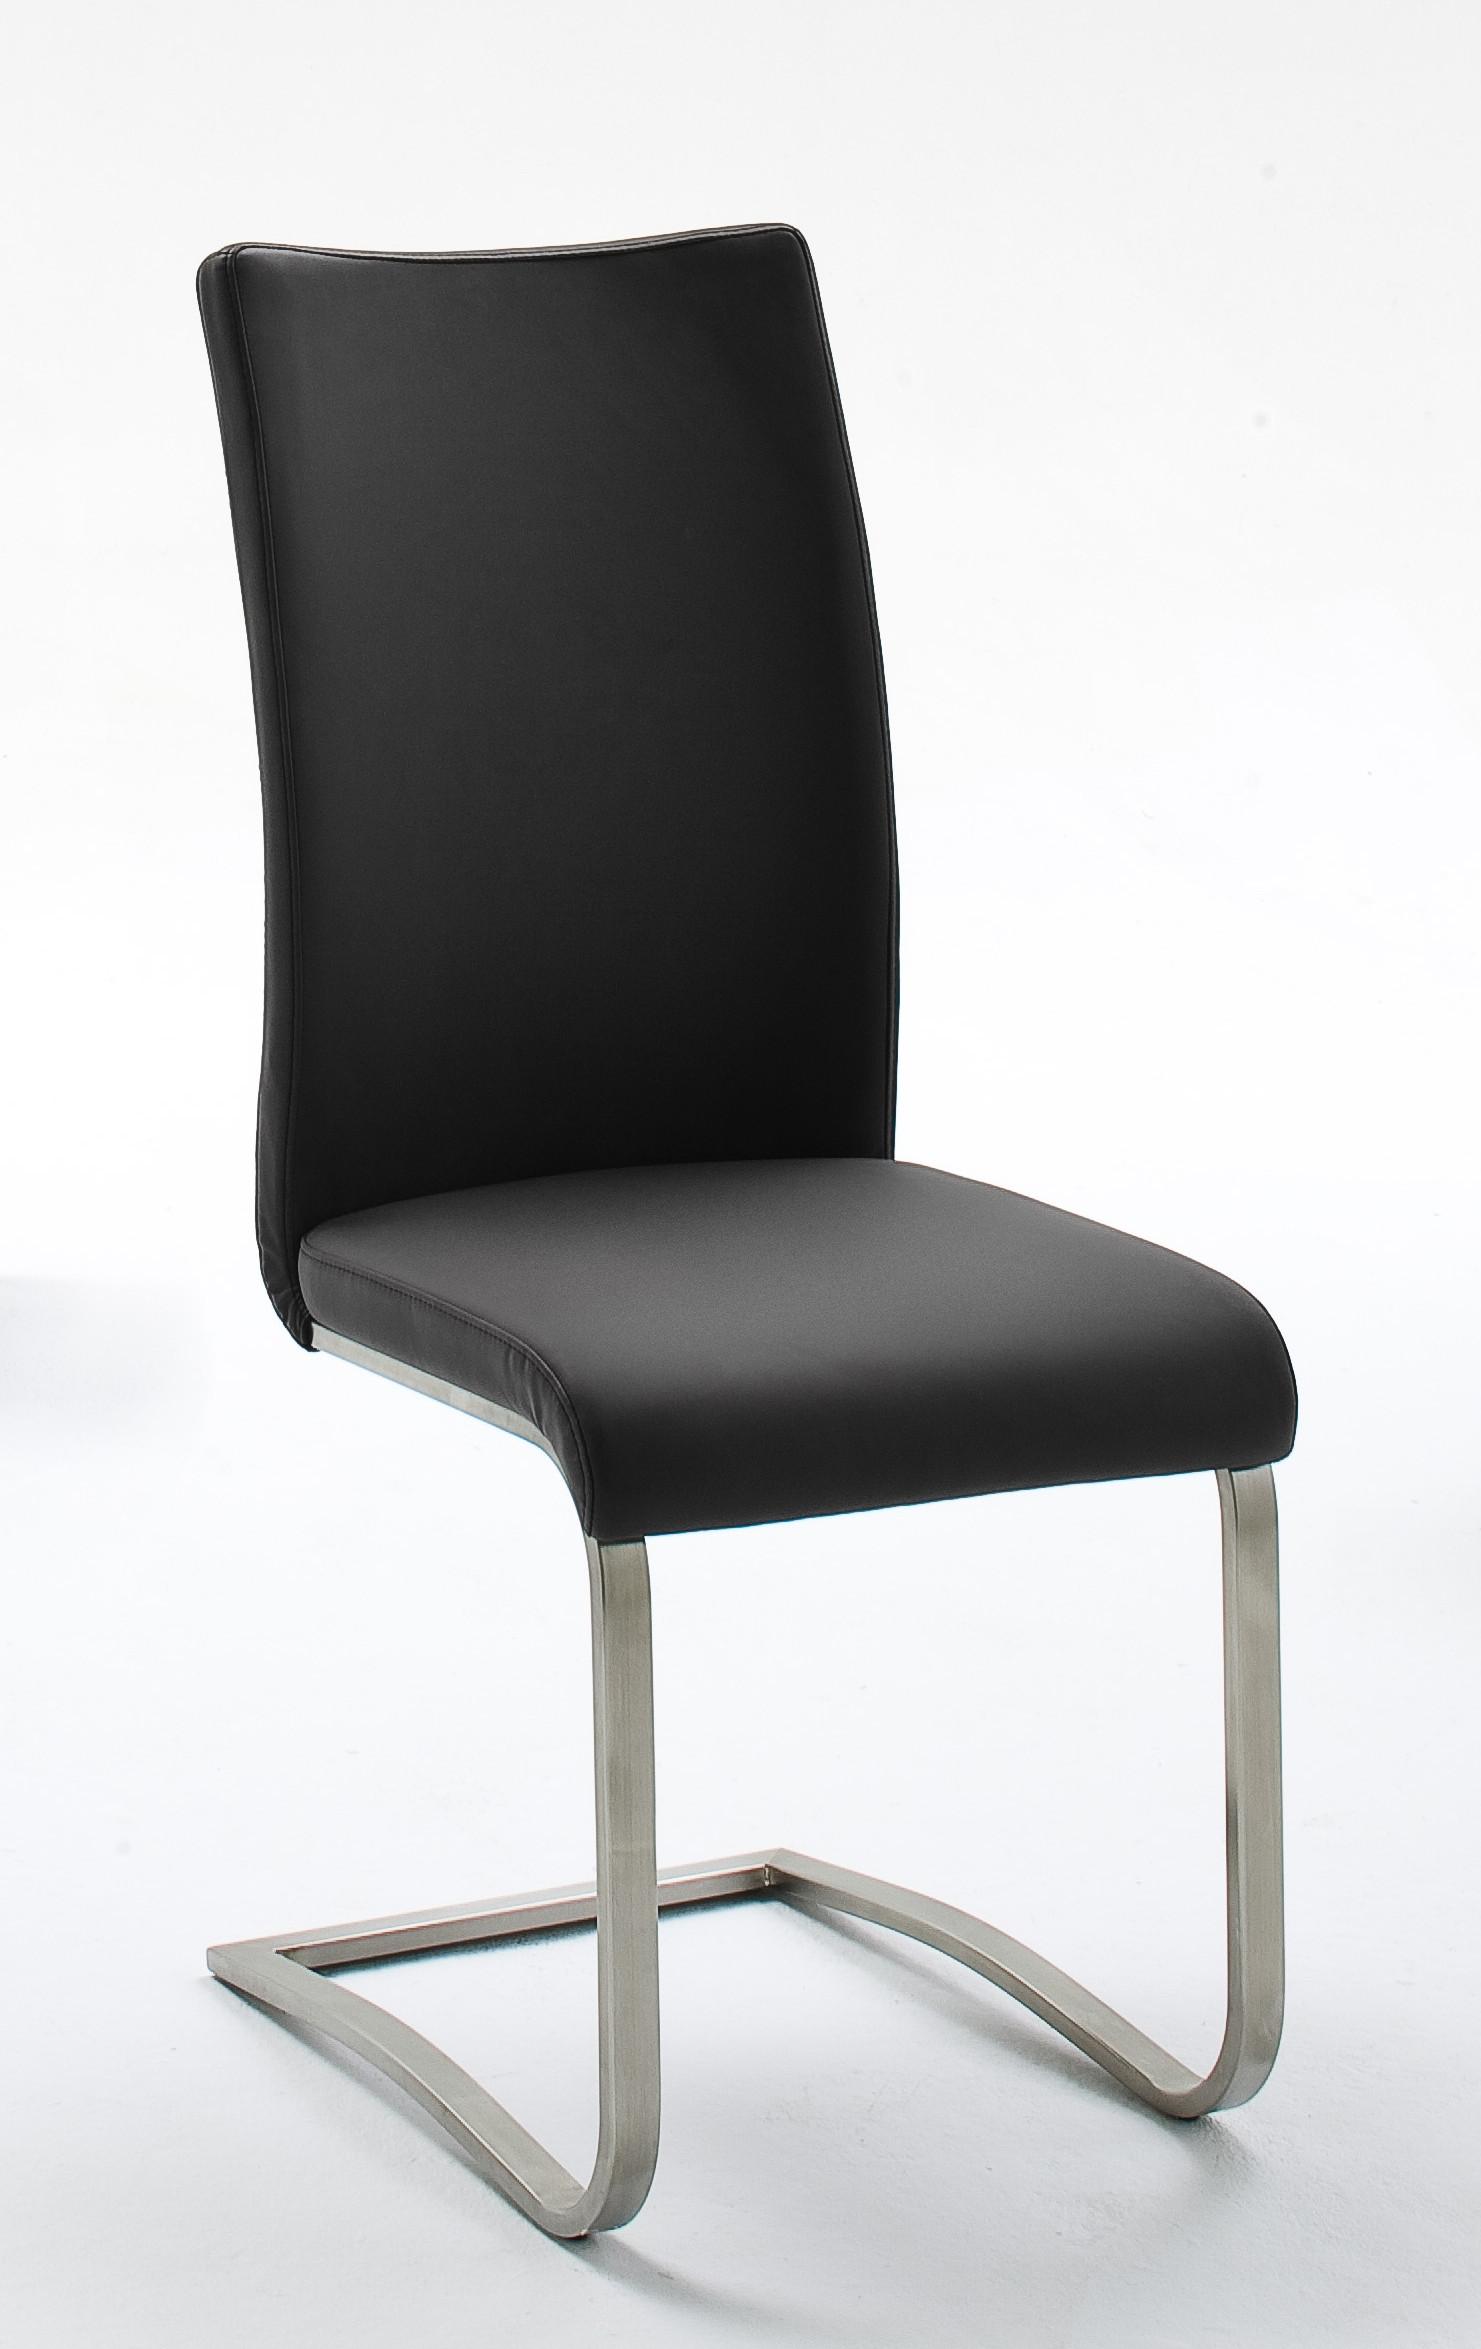 2er-set Schwingstuhl Bezug Leder Schwarz Woody 41-01290 Echtleder neutral